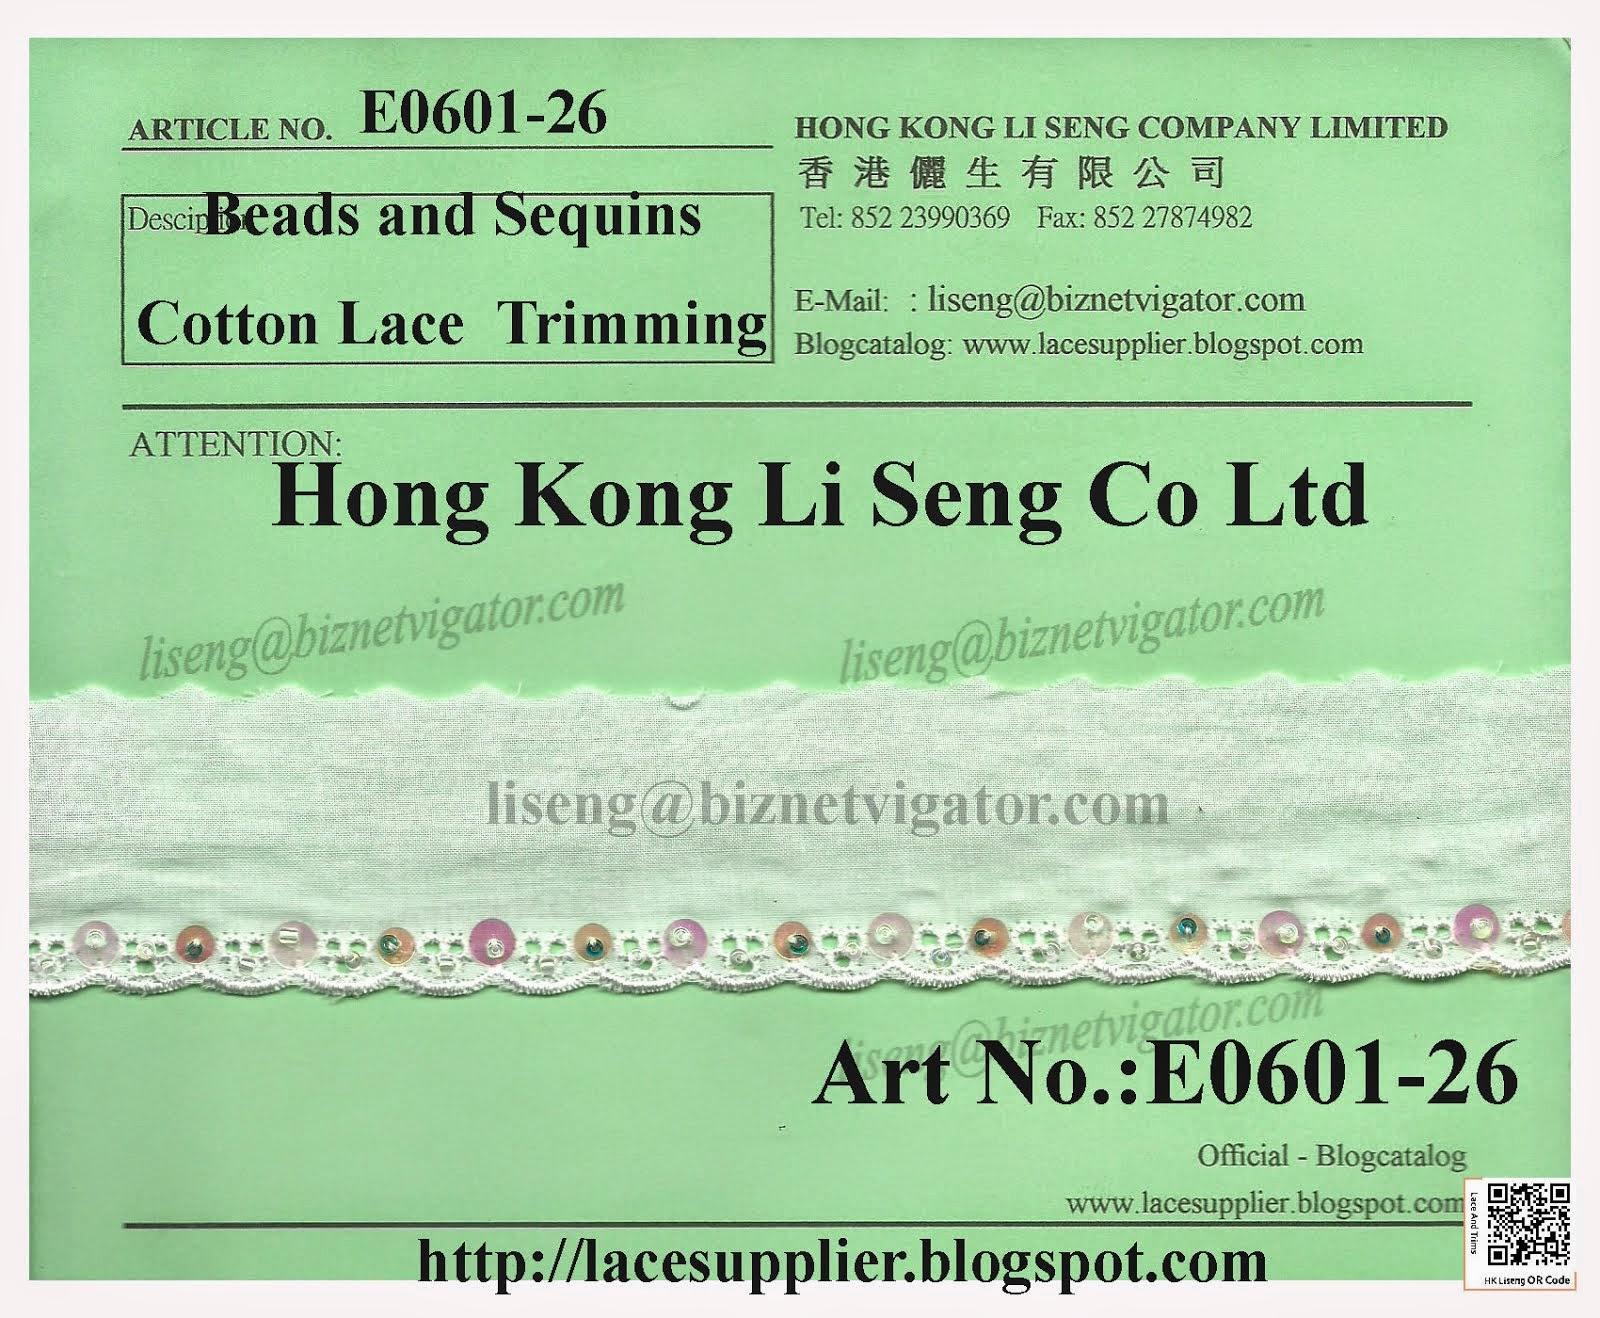 Cotton Lace Trims With Beads and Sequins Manufacturer - Hong Kong Li Seng Co Ltd